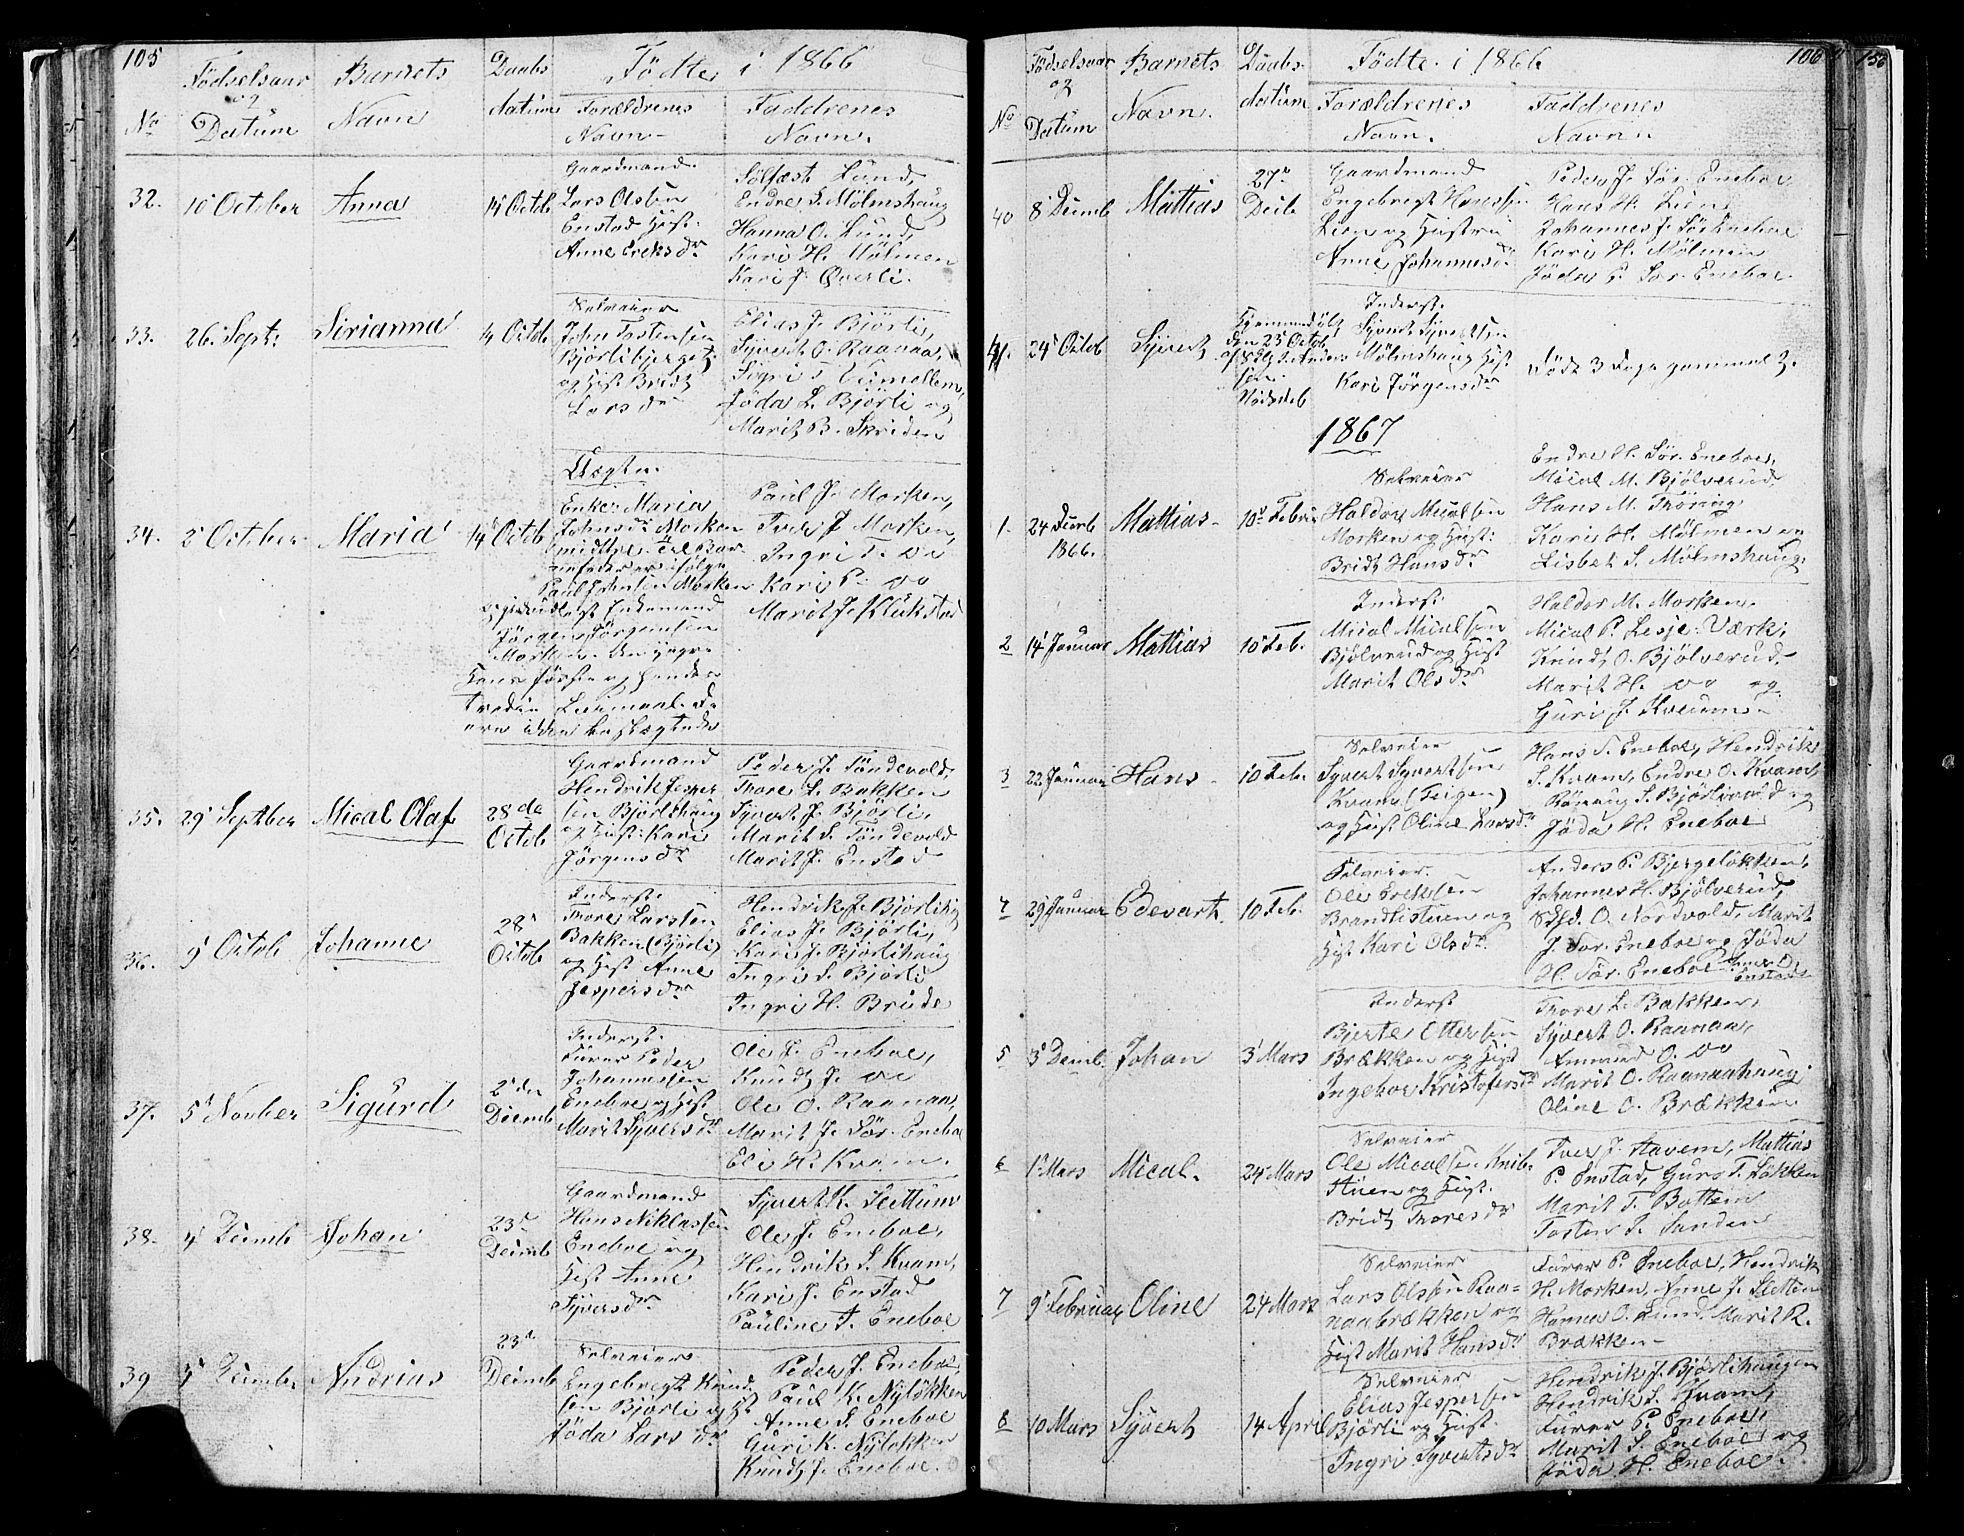 SAH, Lesja prestekontor, Klokkerbok nr. 4, 1842-1871, s. 105-106